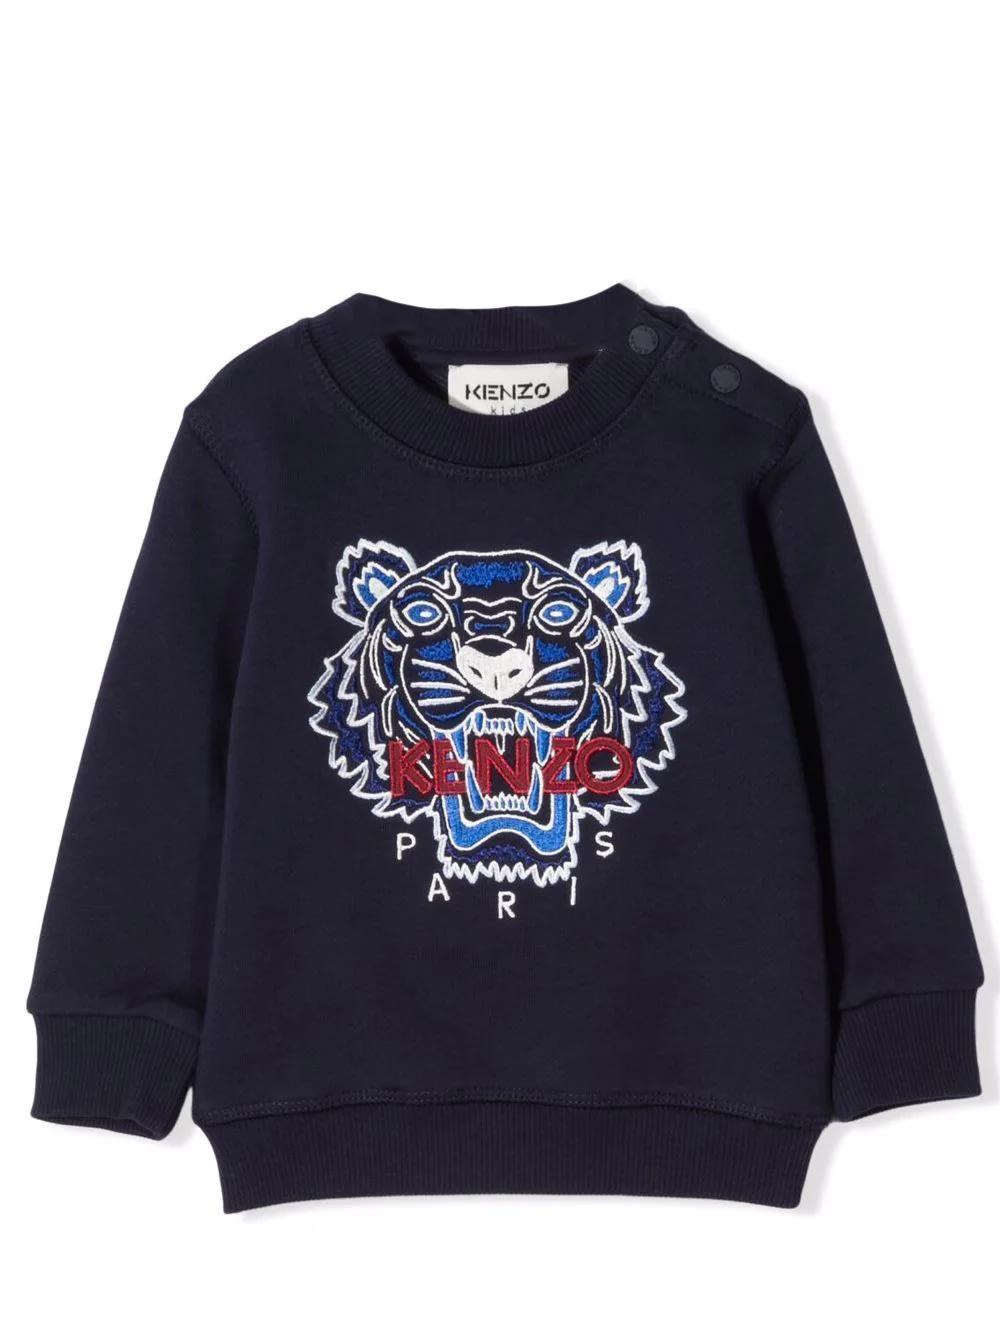 Baby Sweatshirt With Embroidery